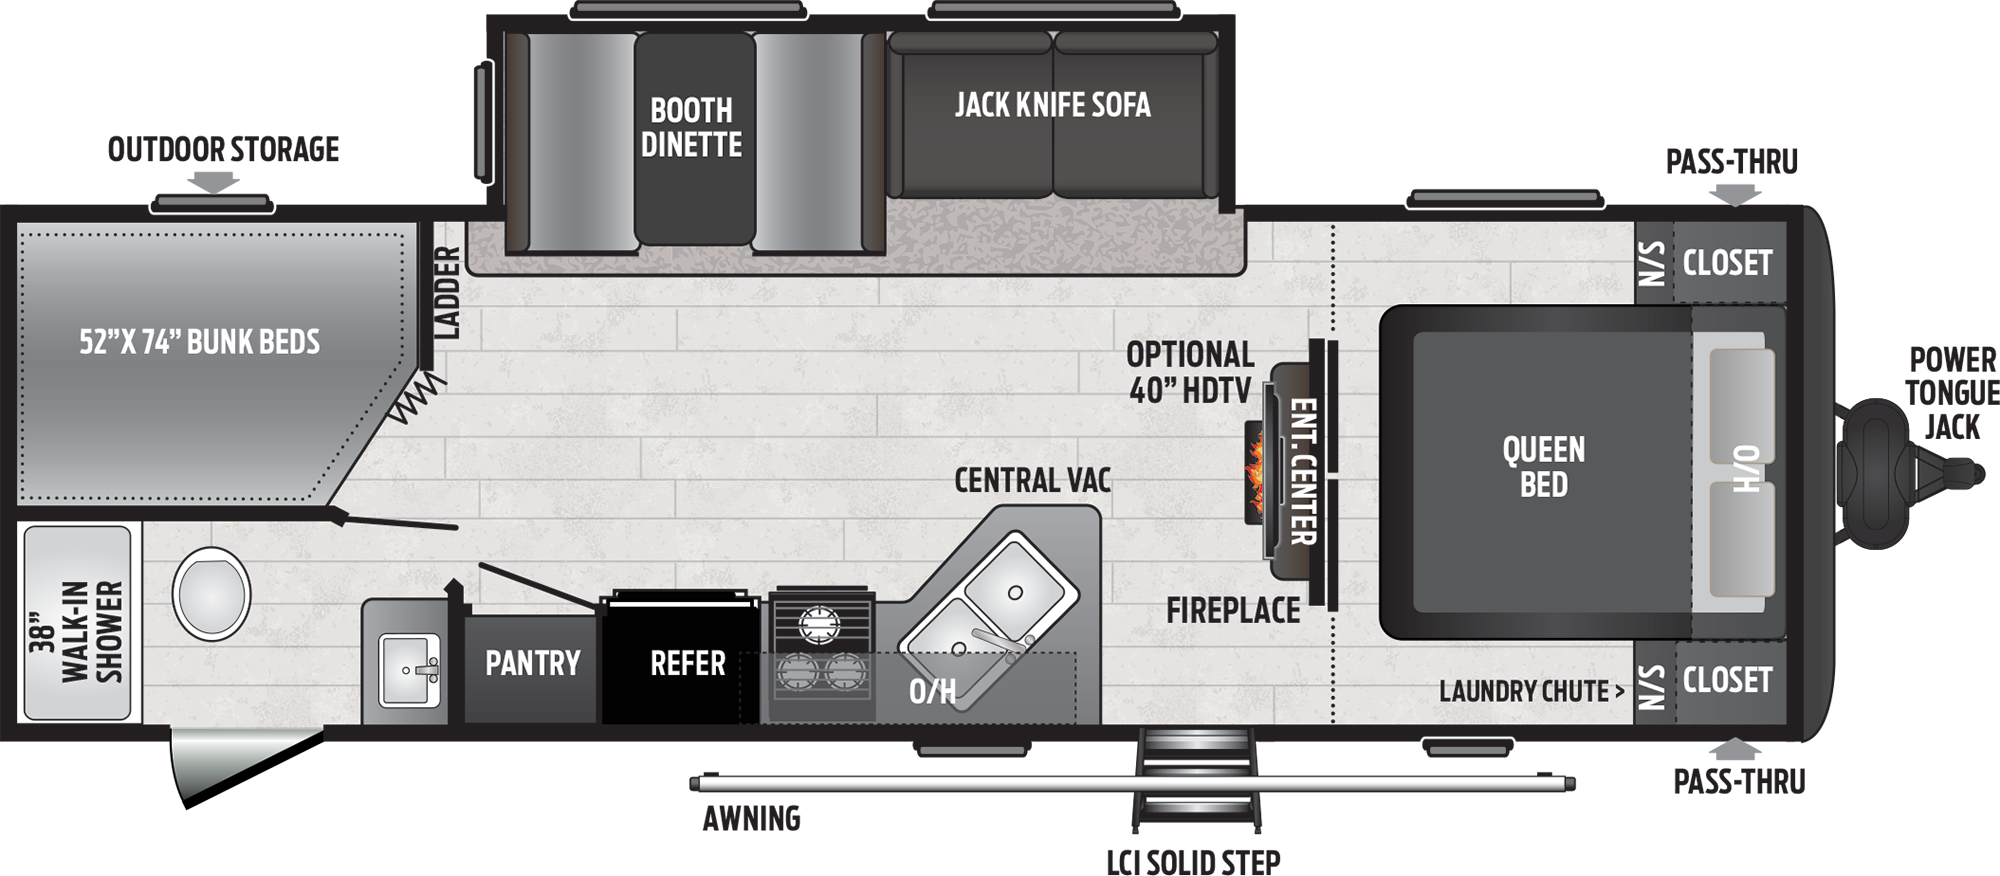 keystone hideout travel trailer floorplan